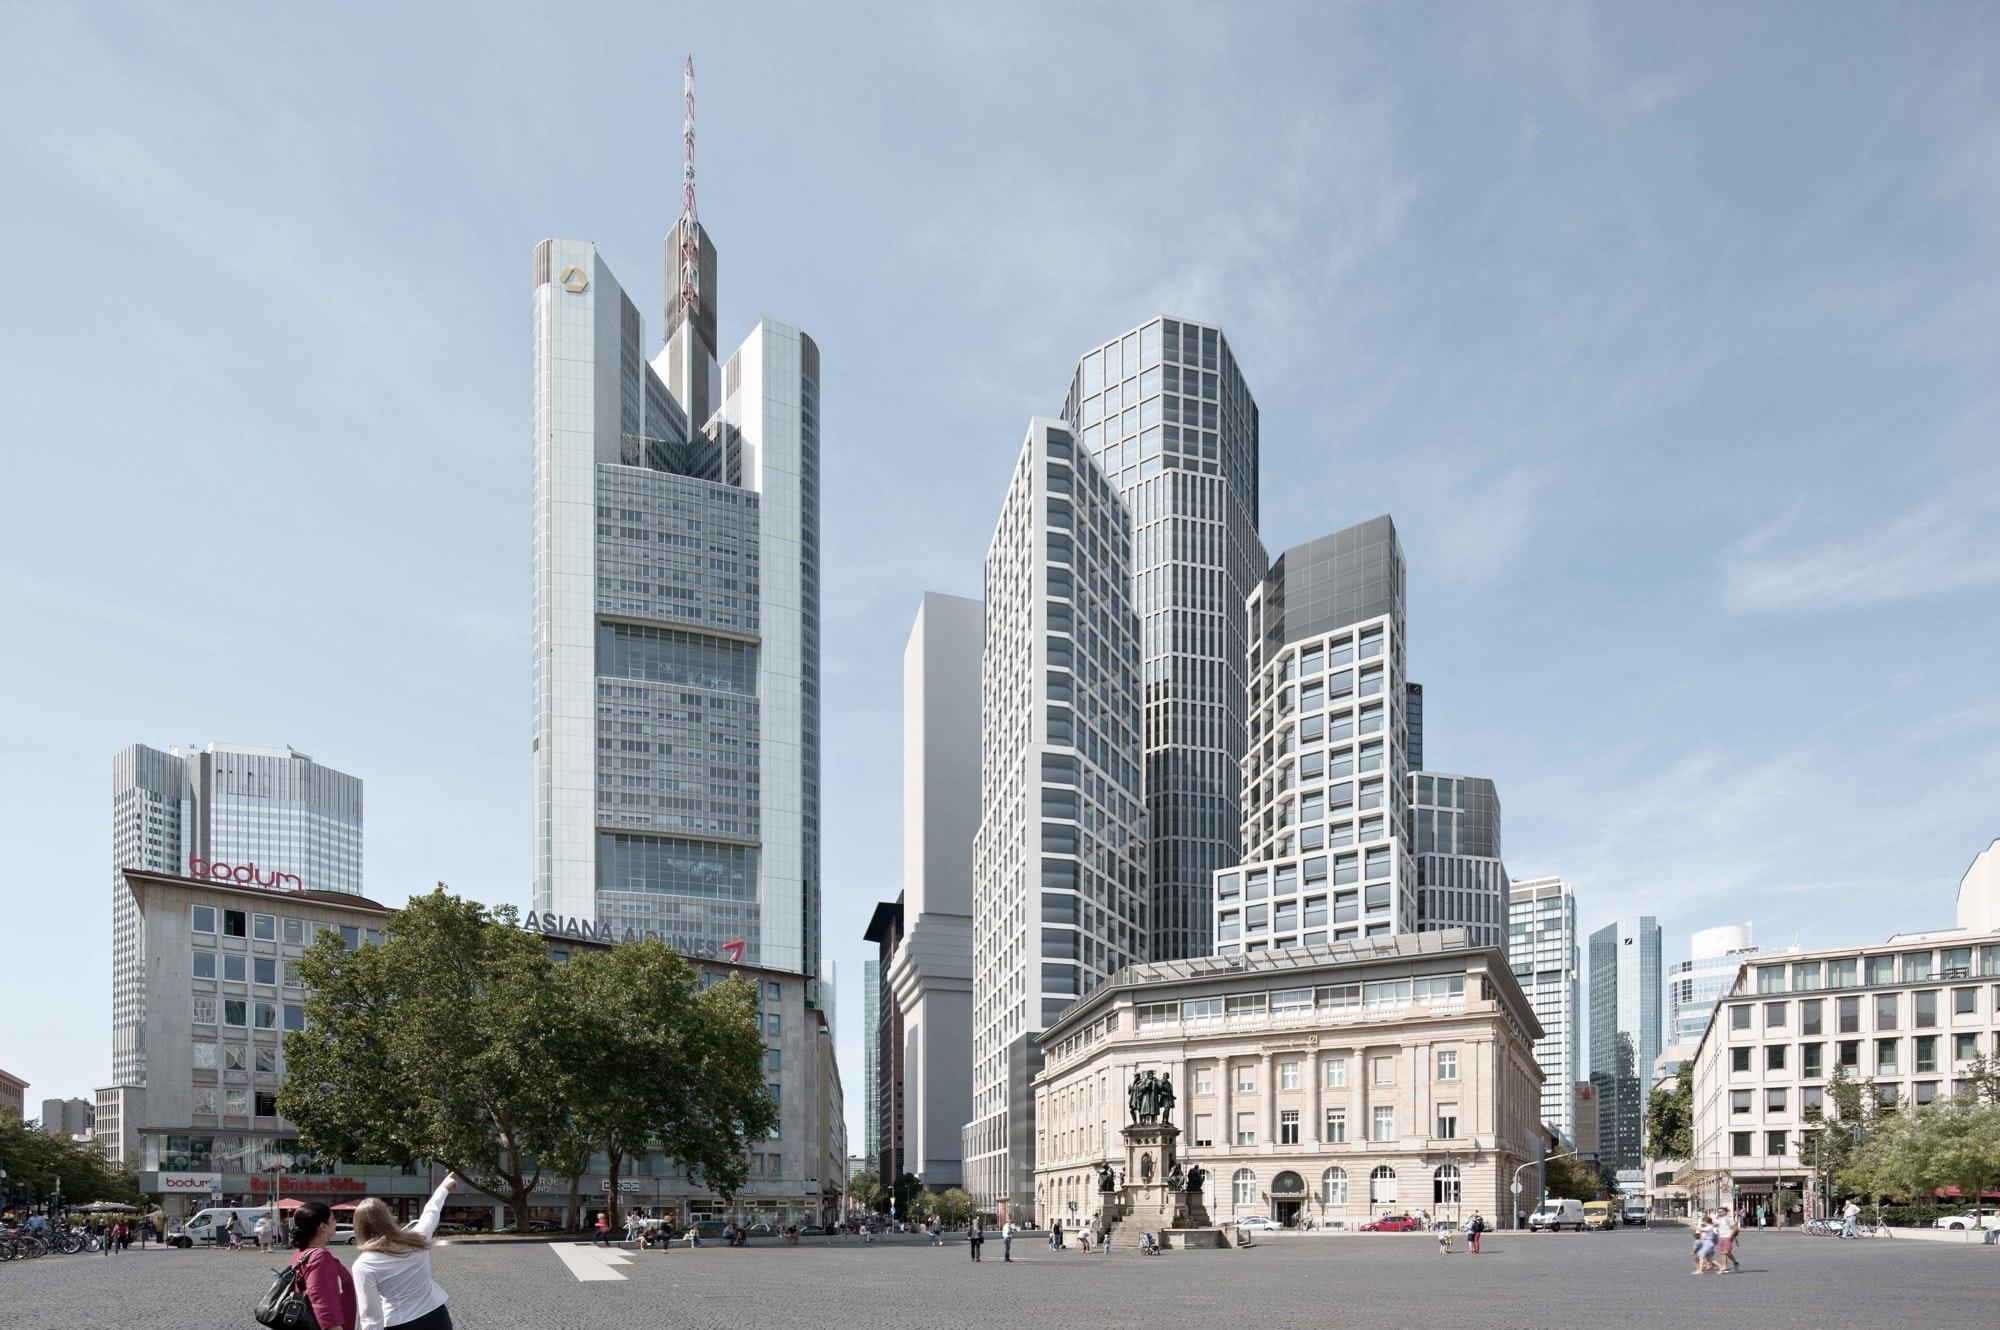 Ergebnis Deutsche Bank Areal Competitionline